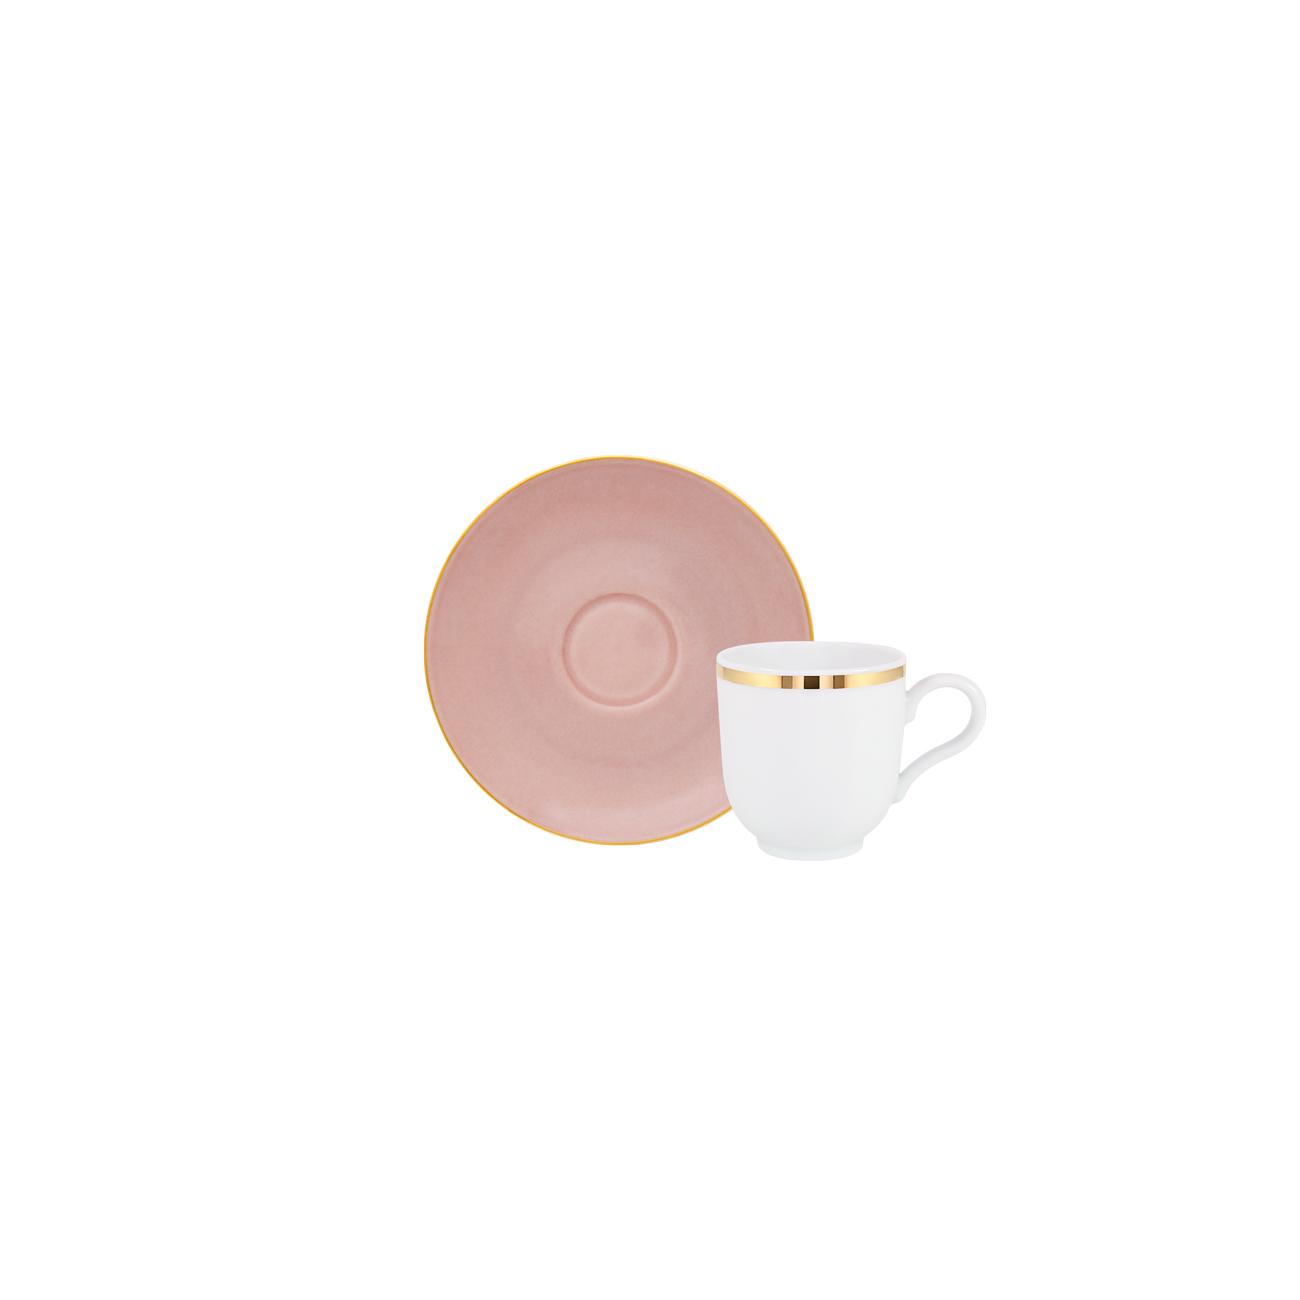 Golden   Chávena Café 10cl Antar + Passion Gold   Pires Café 12cm Olympus 0